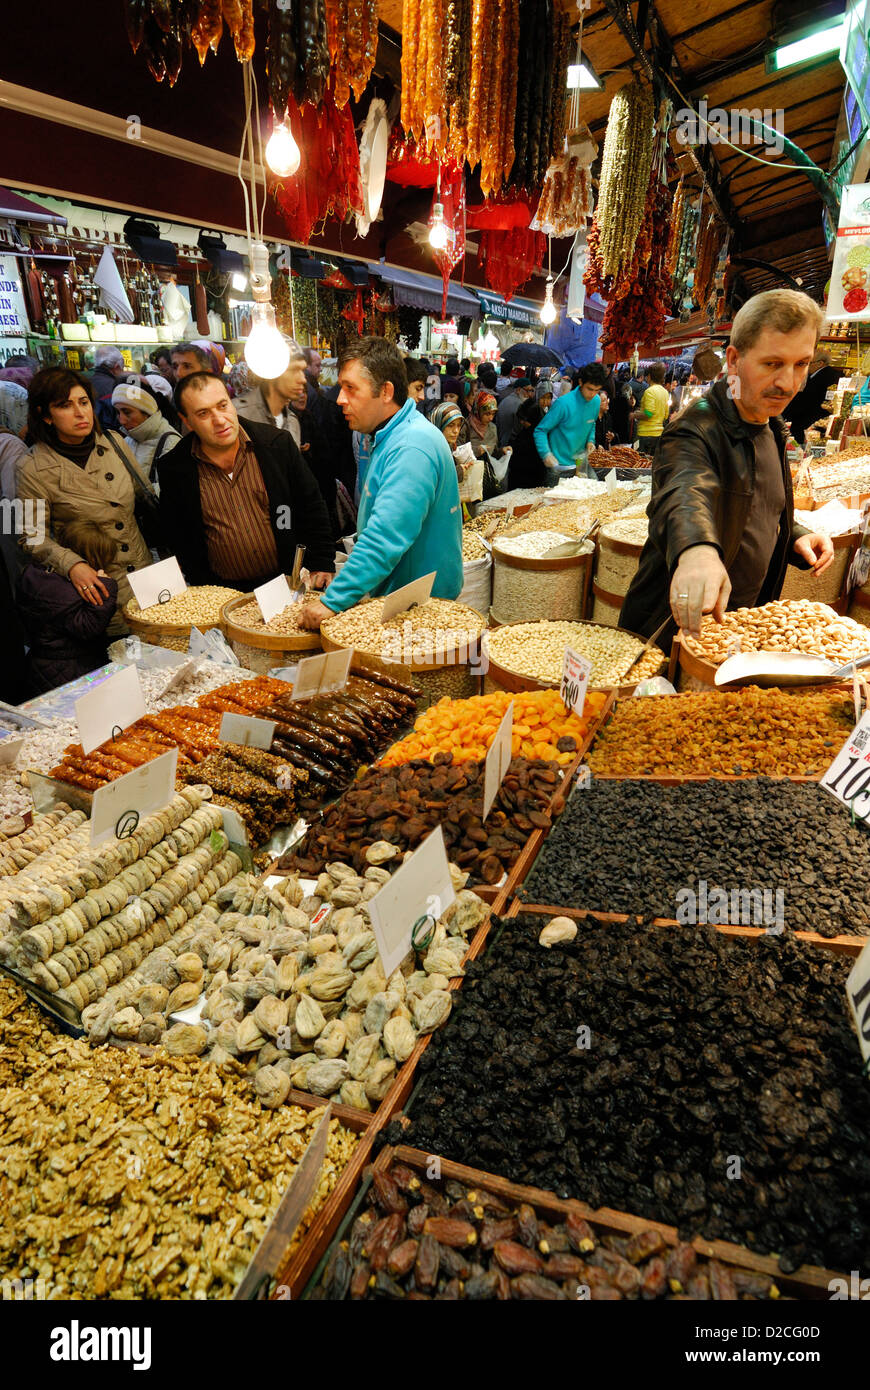 Istanbul. Turkey. Nuts & dried fruits at the Spice Bazaar aka Egyptian Bazaar. - Stock Image